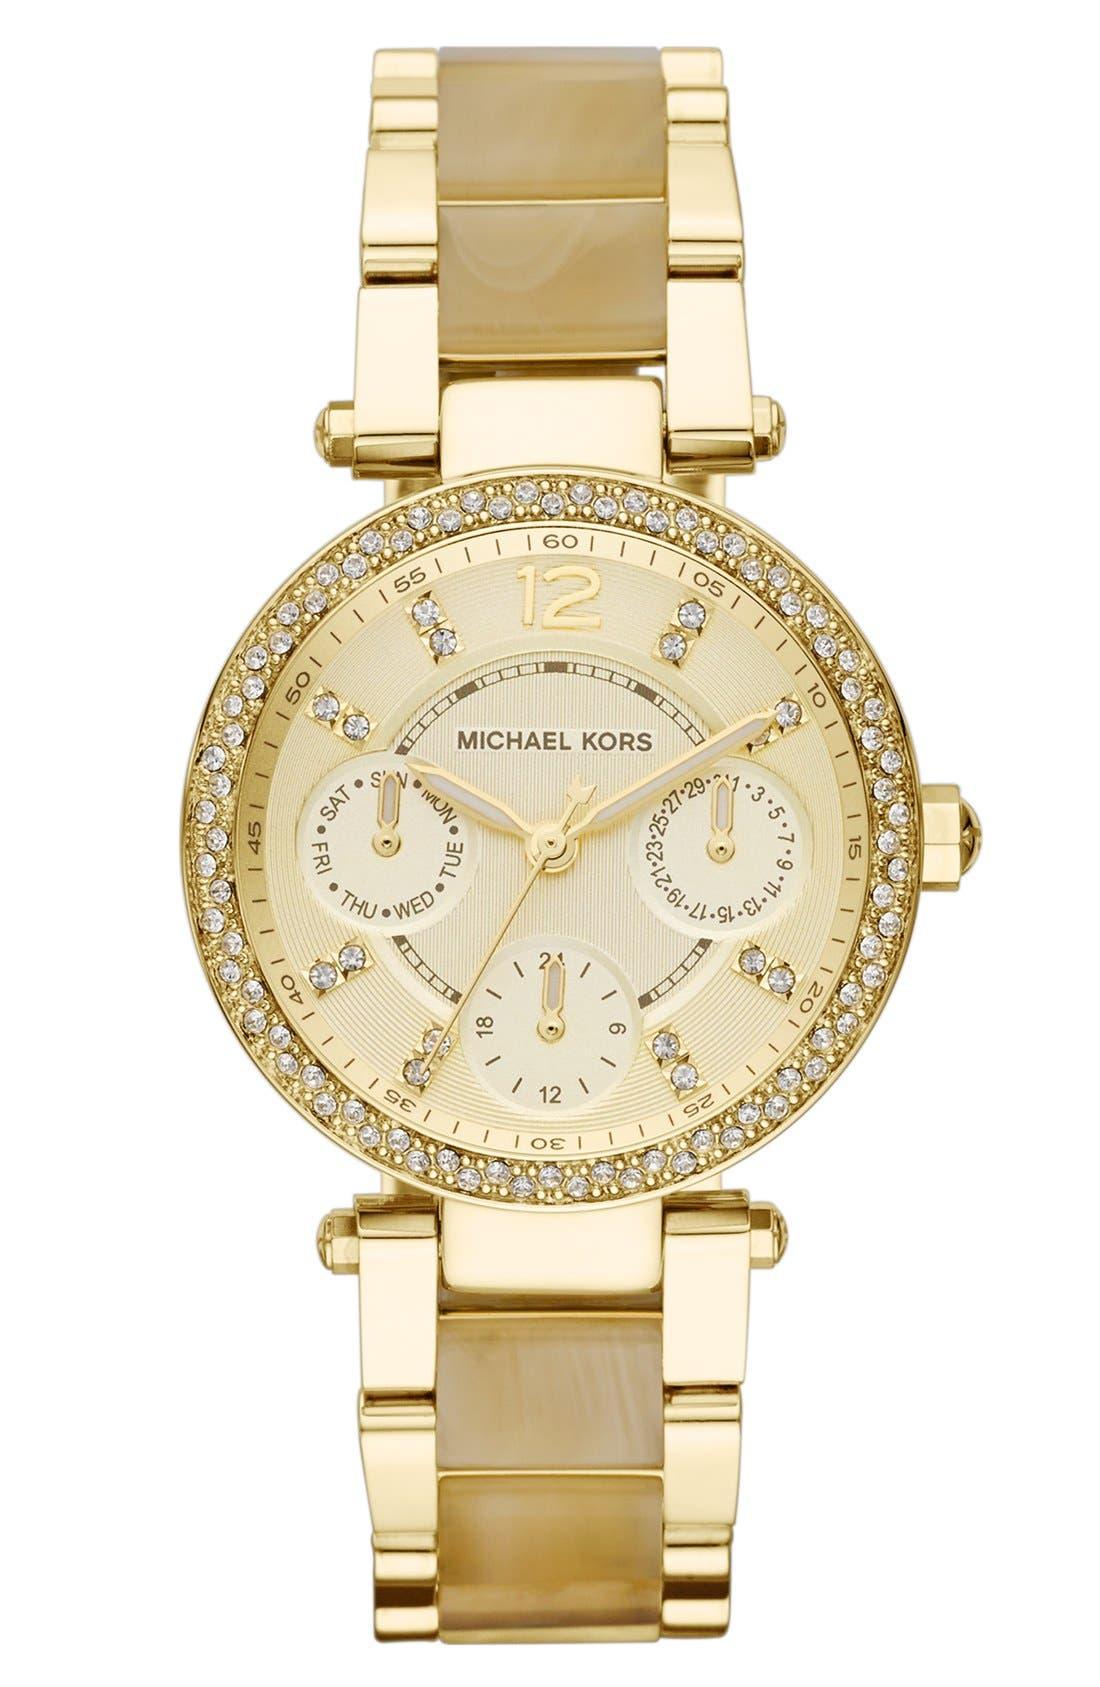 Main Image - Michael Kors 'Mini Parker' Crystal Bezel Bracelet Watch, 33mm